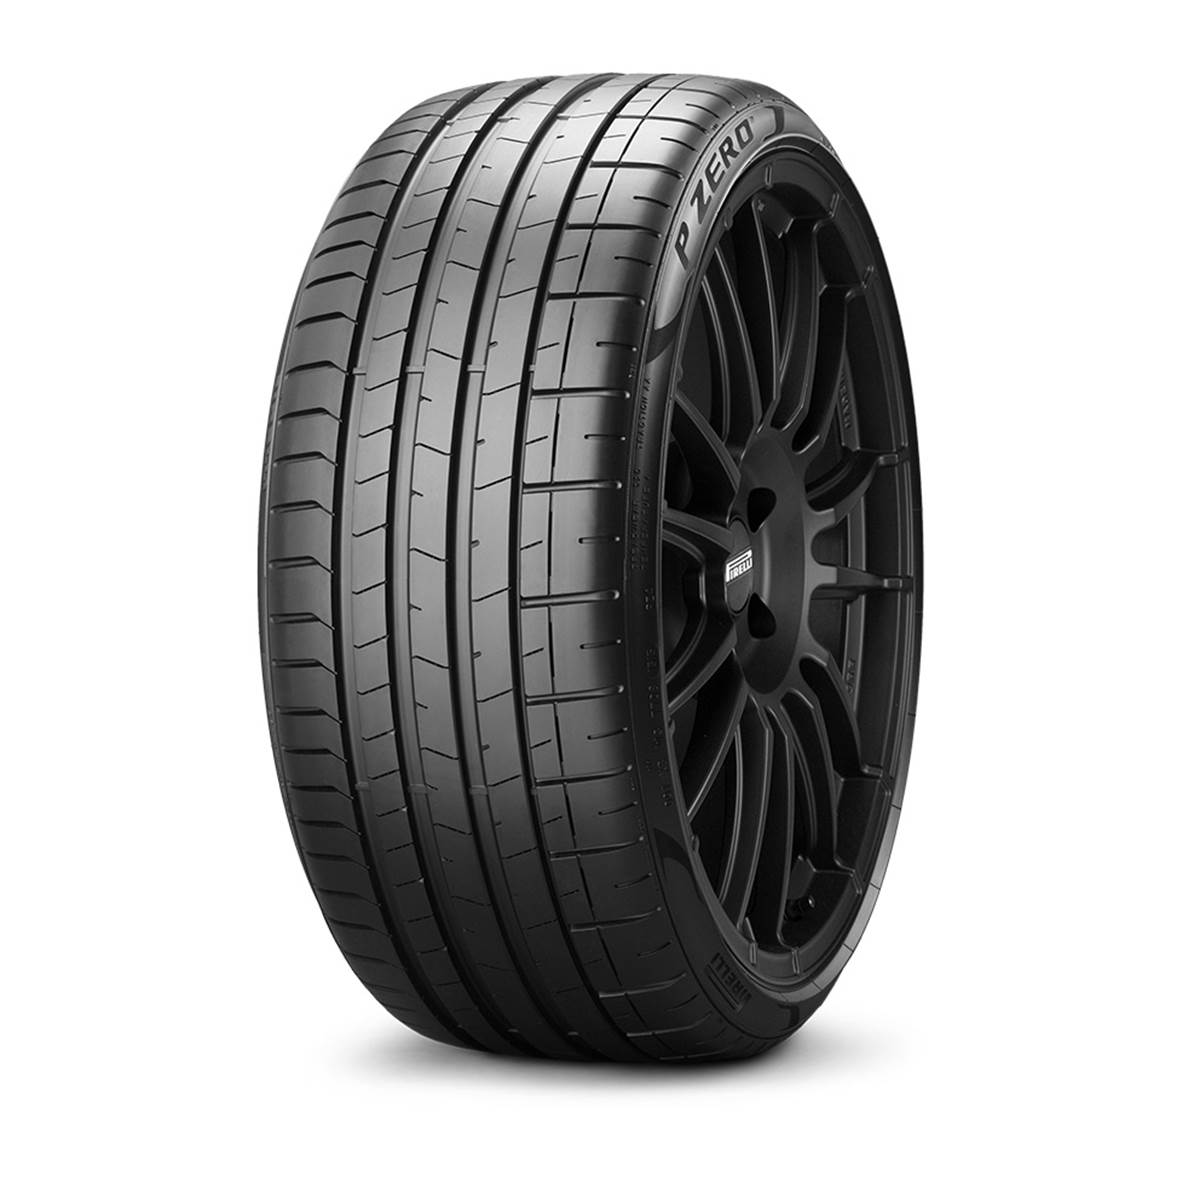 Pneu Pirelli 315/35R20 106Y P-Zero